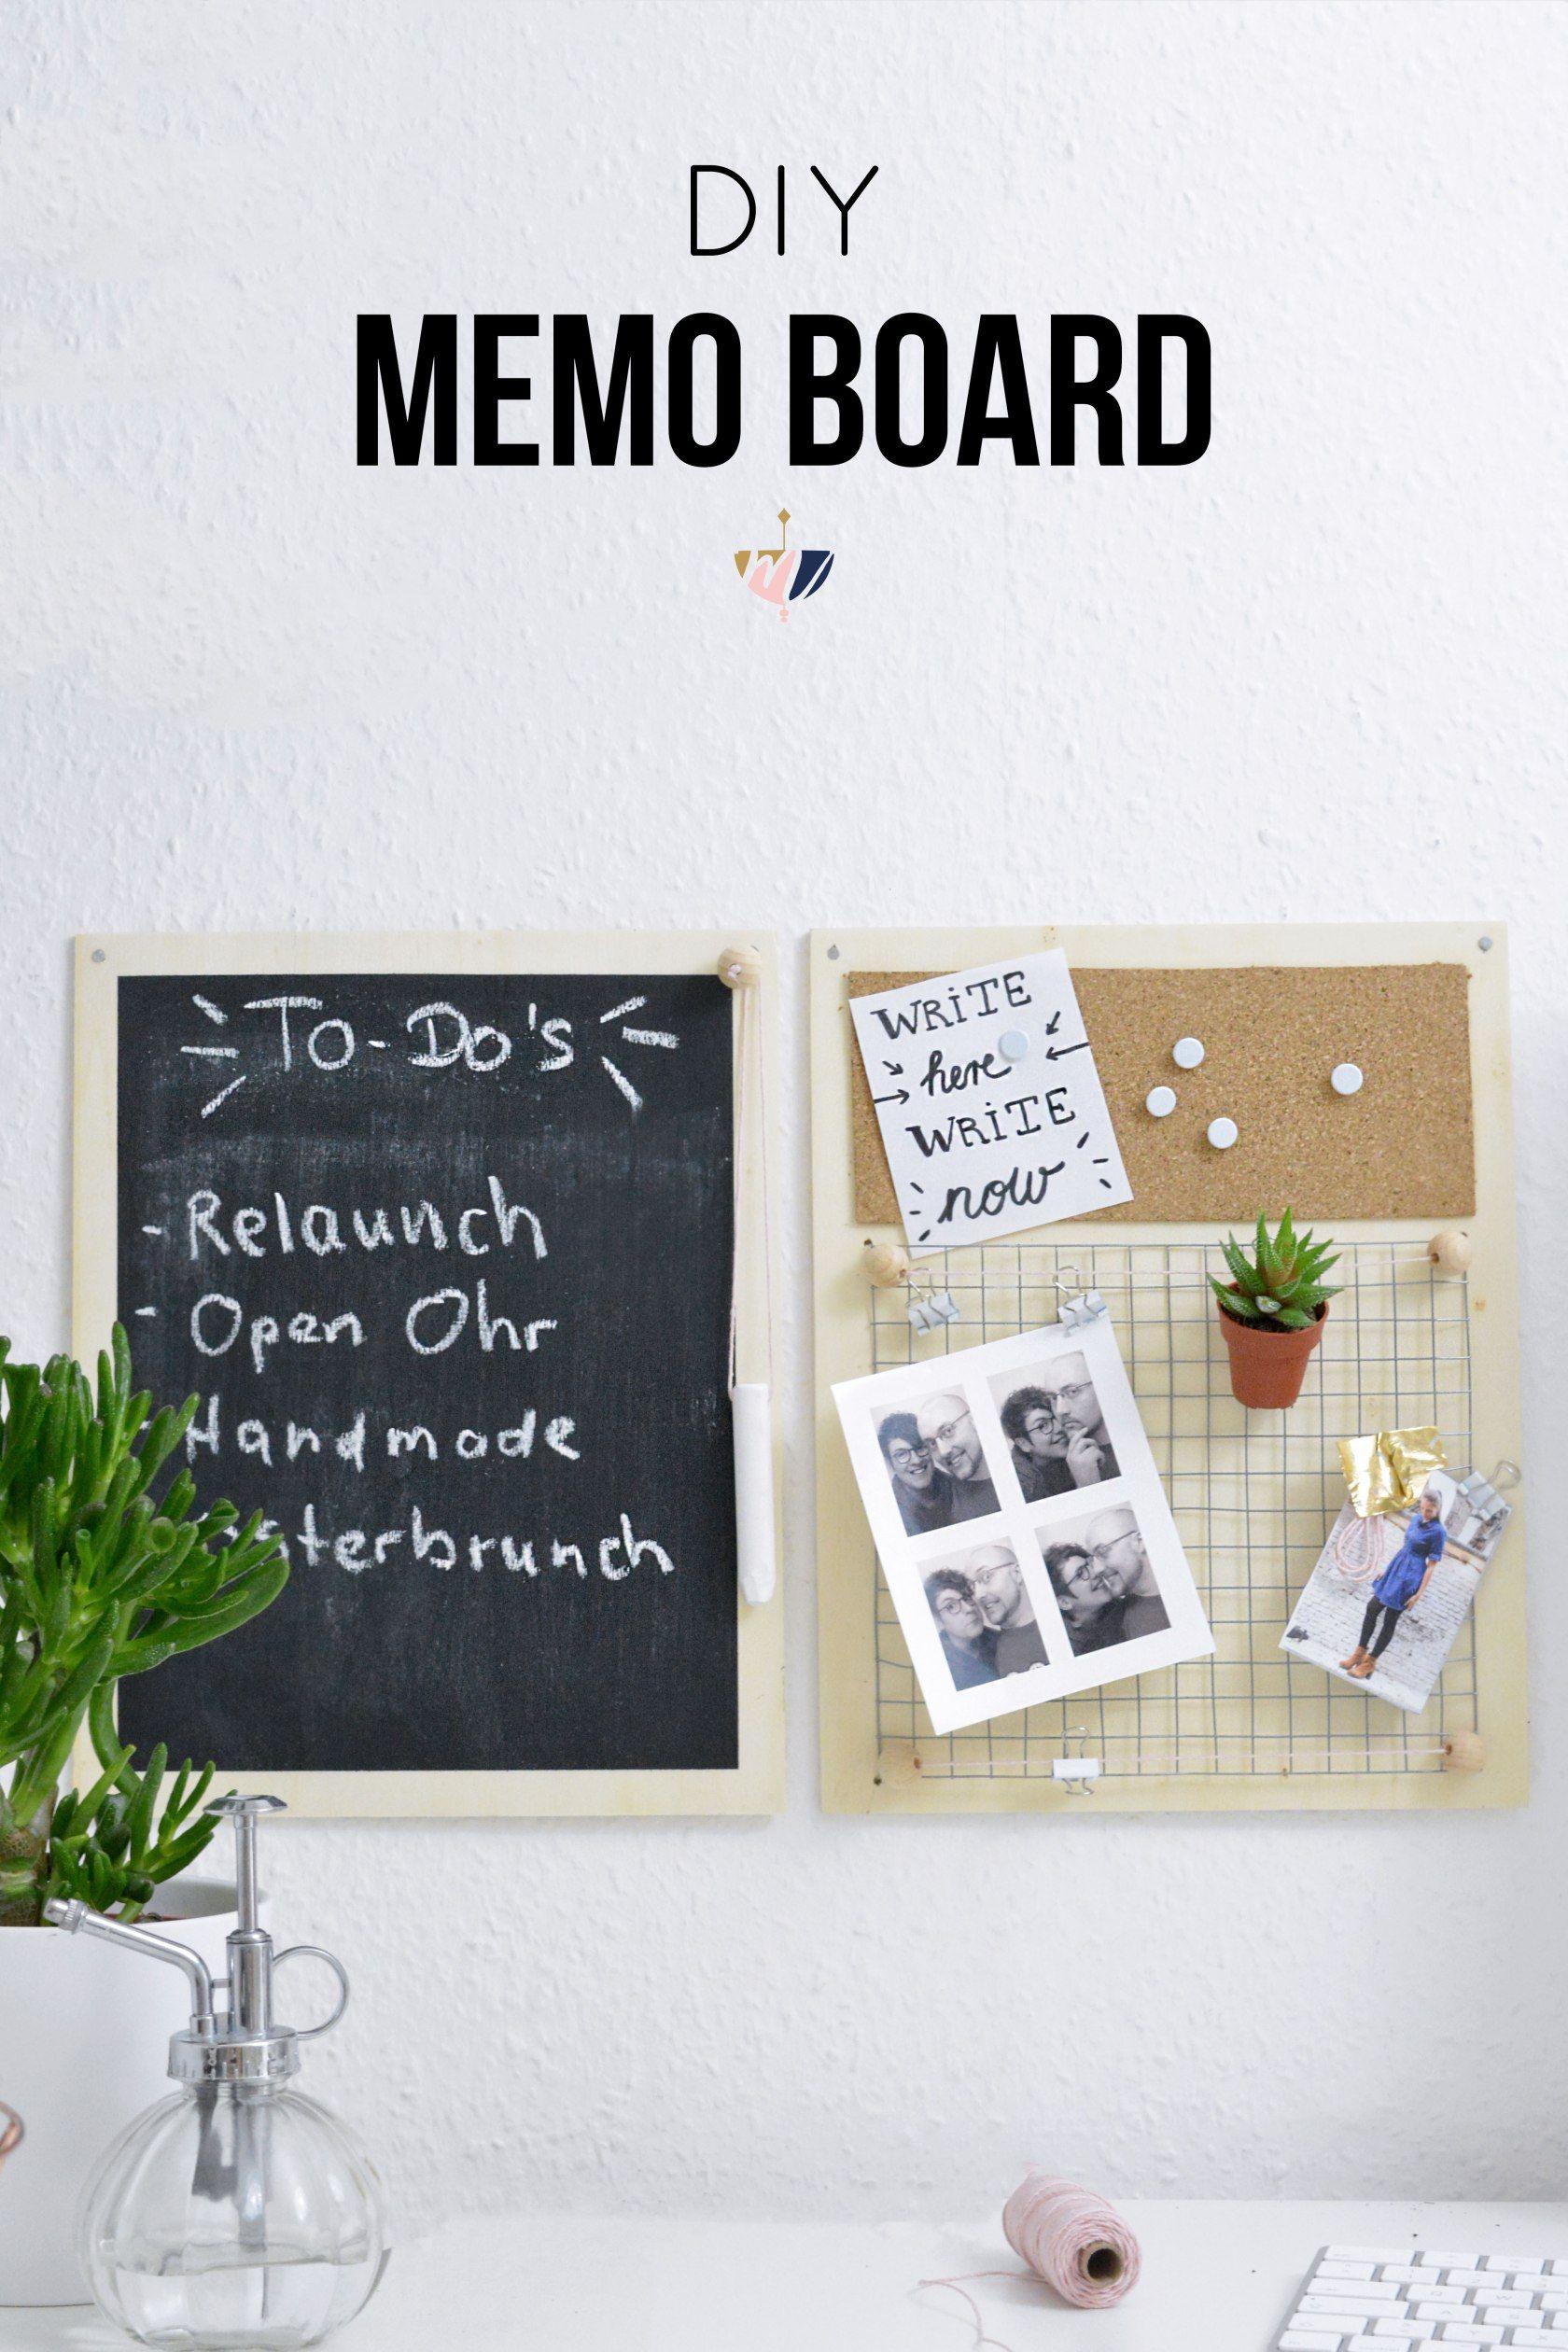 diy holz memo board arbeitszimmer pinterest diy diy memo board und diy videos. Black Bedroom Furniture Sets. Home Design Ideas